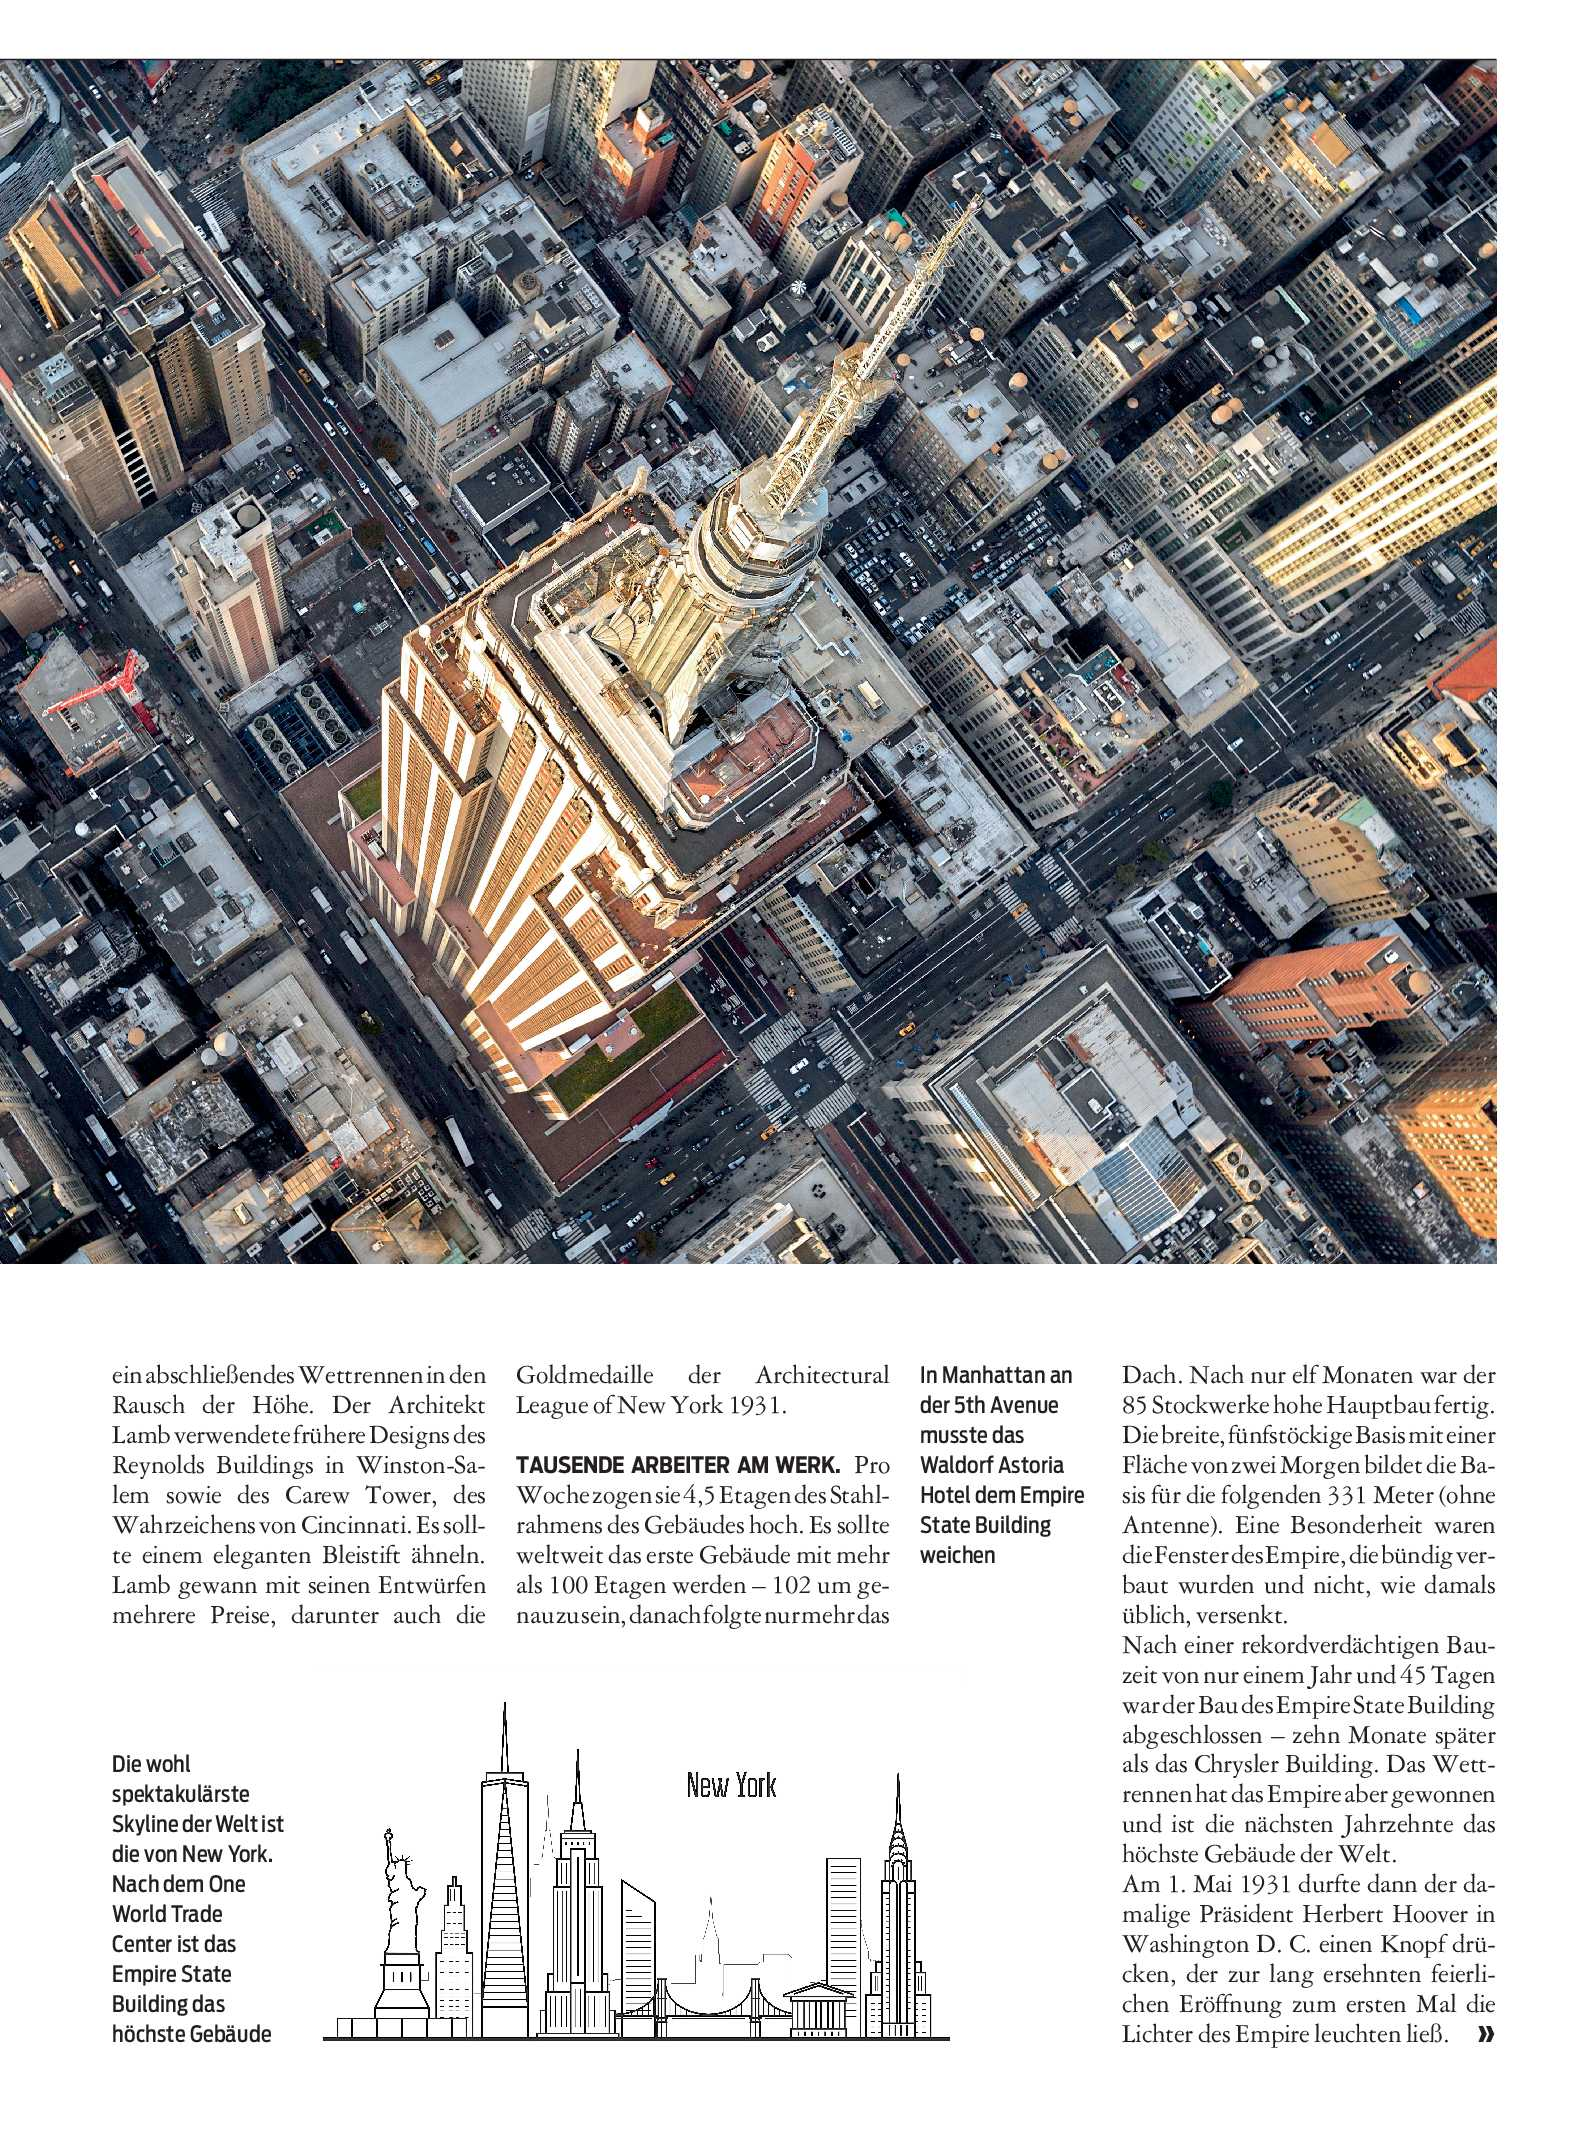 public/epaper/imported/20200930/kurier/magazin/magazin_20200930_045.jpg